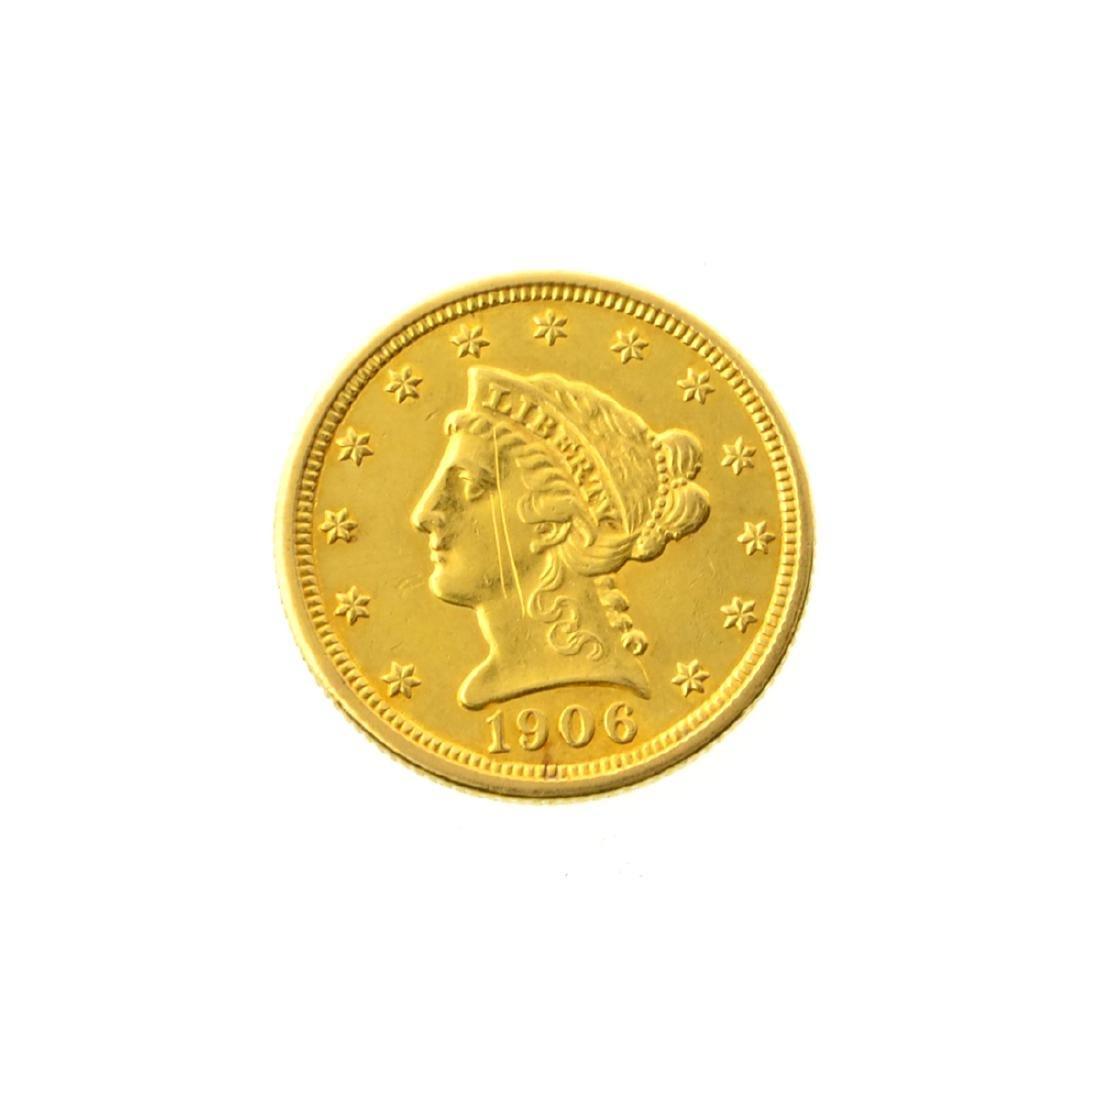 1906 $2 50 U S  Liberty Head Gold Coin